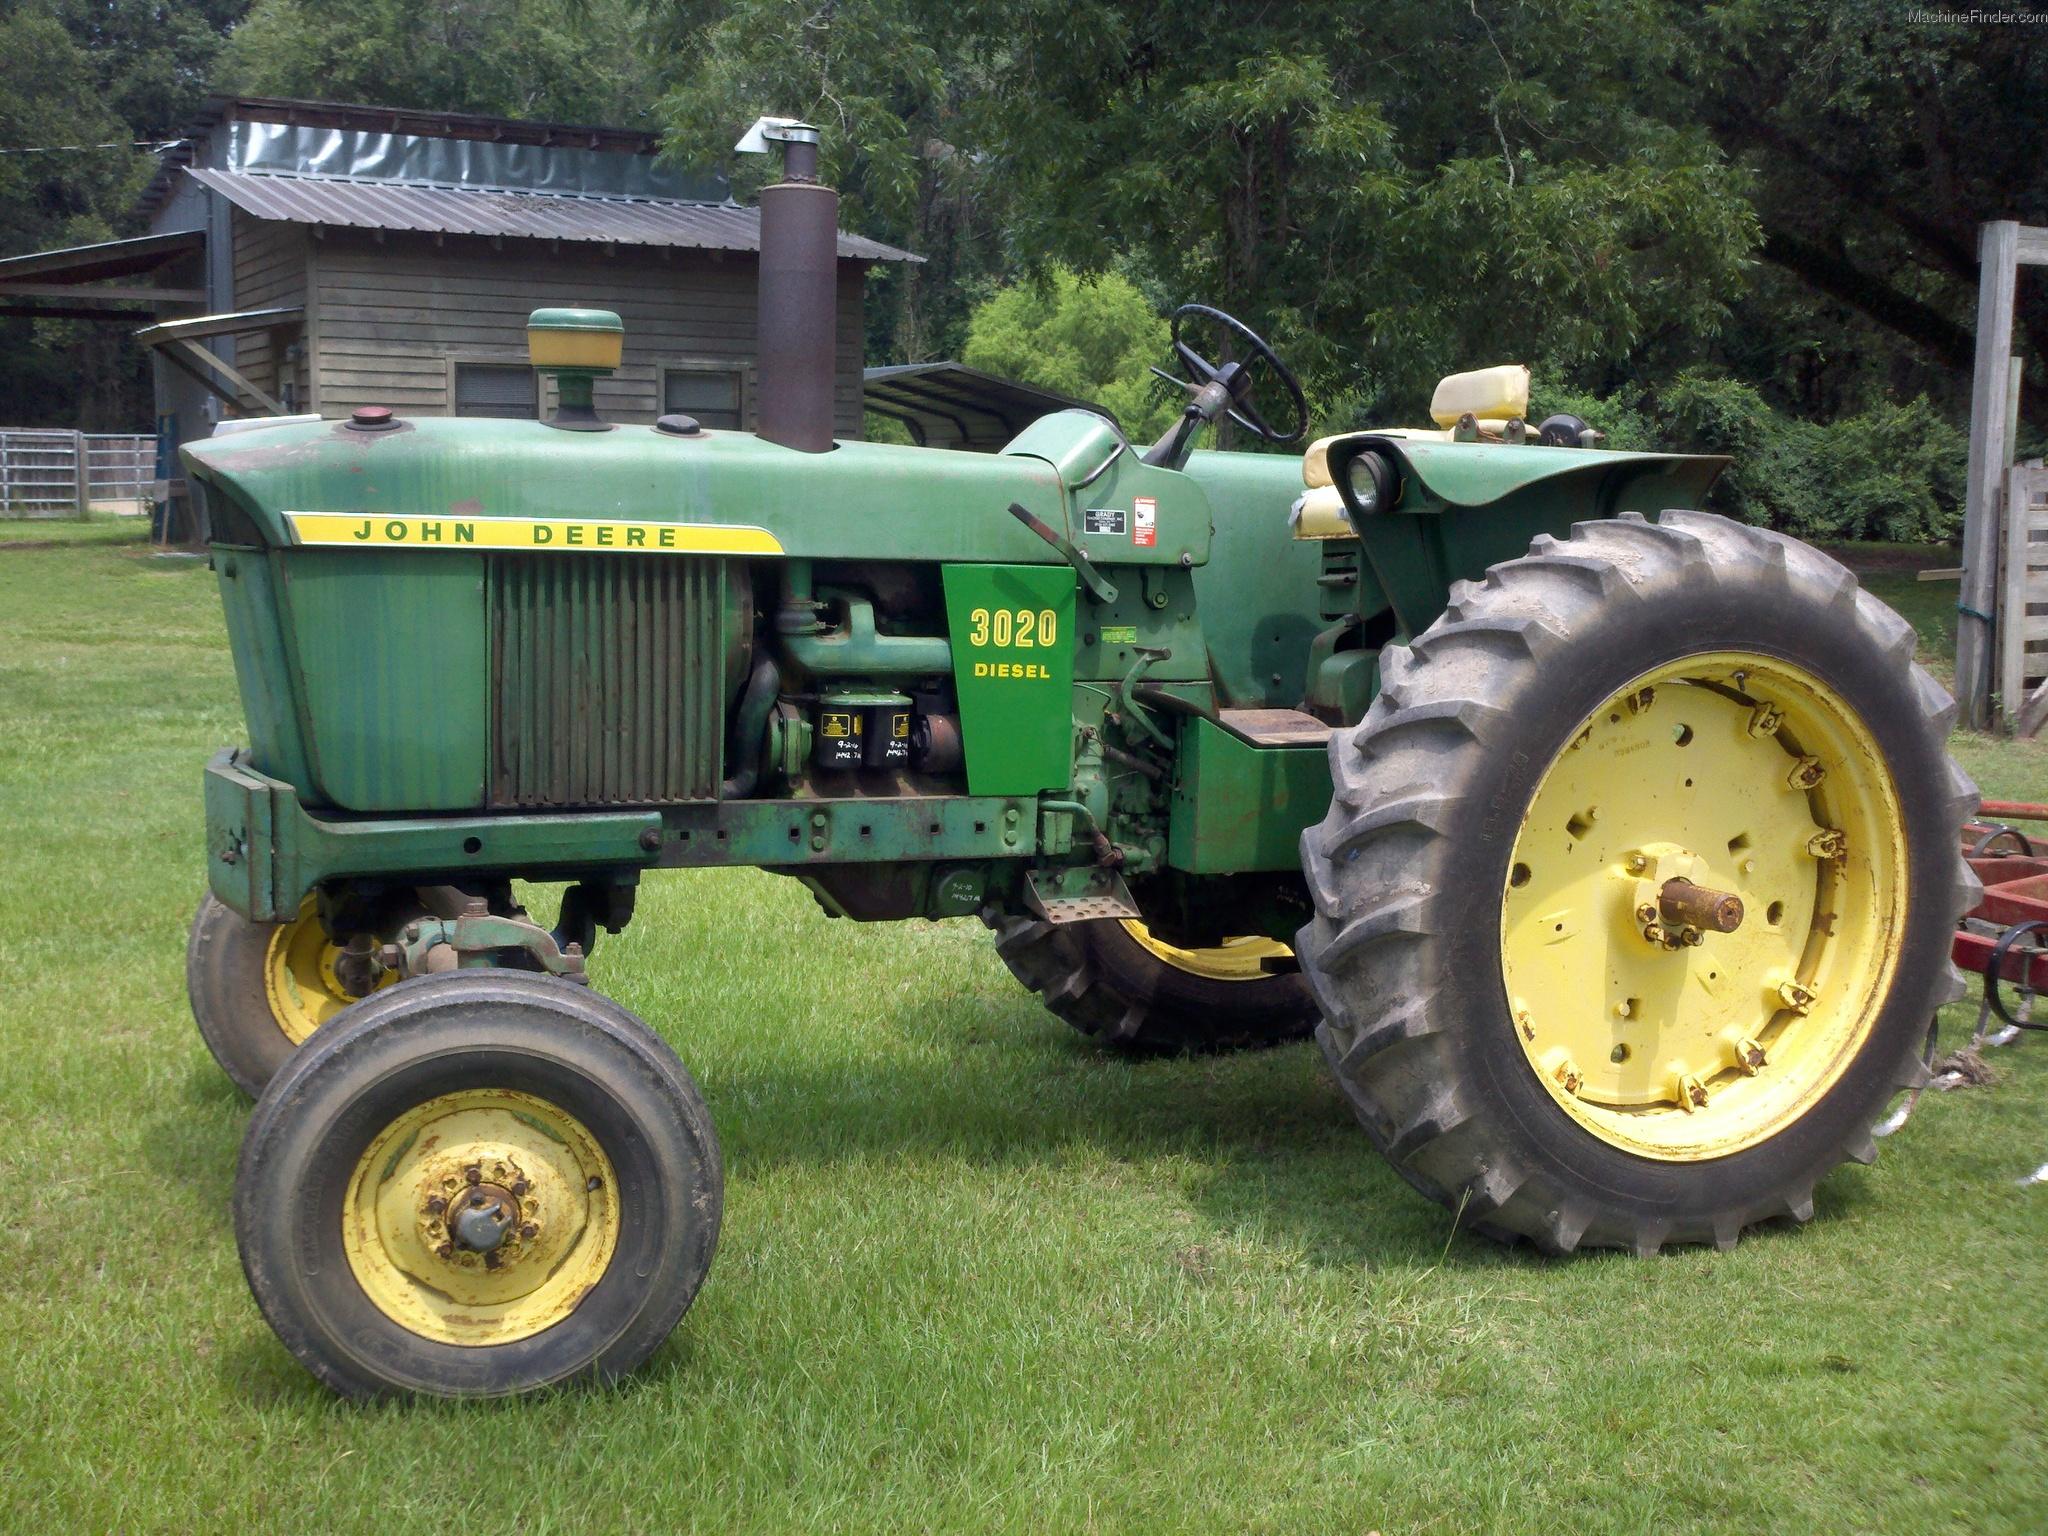 1976 John Deere 3020 Tractors - Utility (40-100hp) - John ...